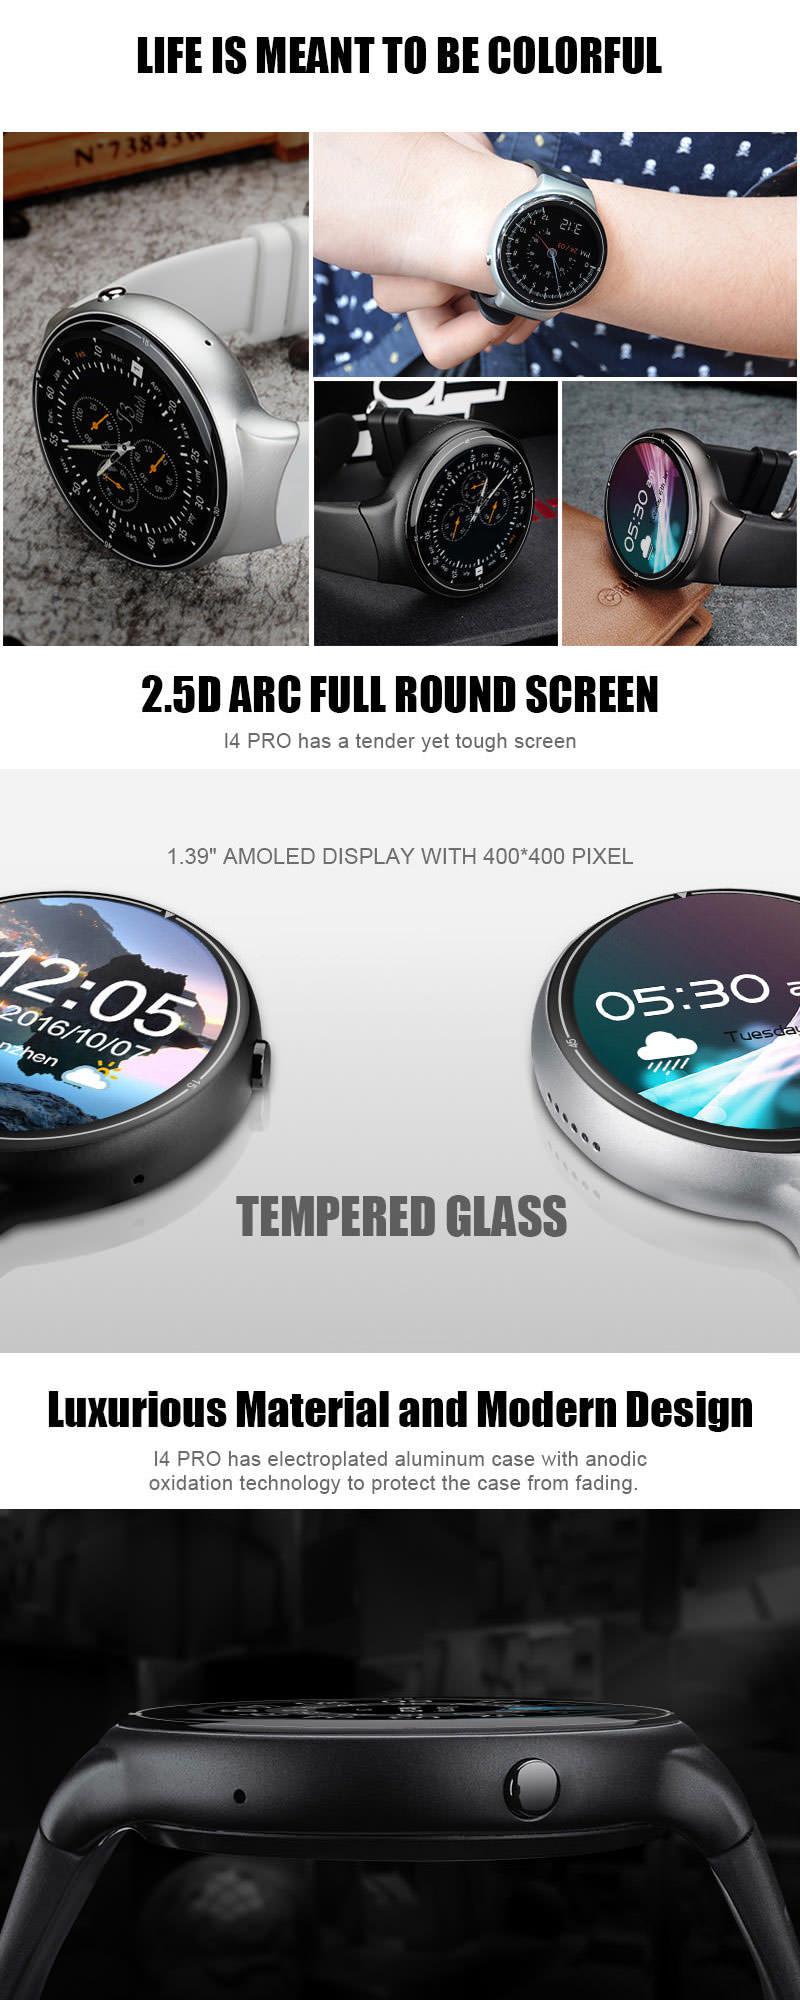 iqi i4 pro smartwatch phone